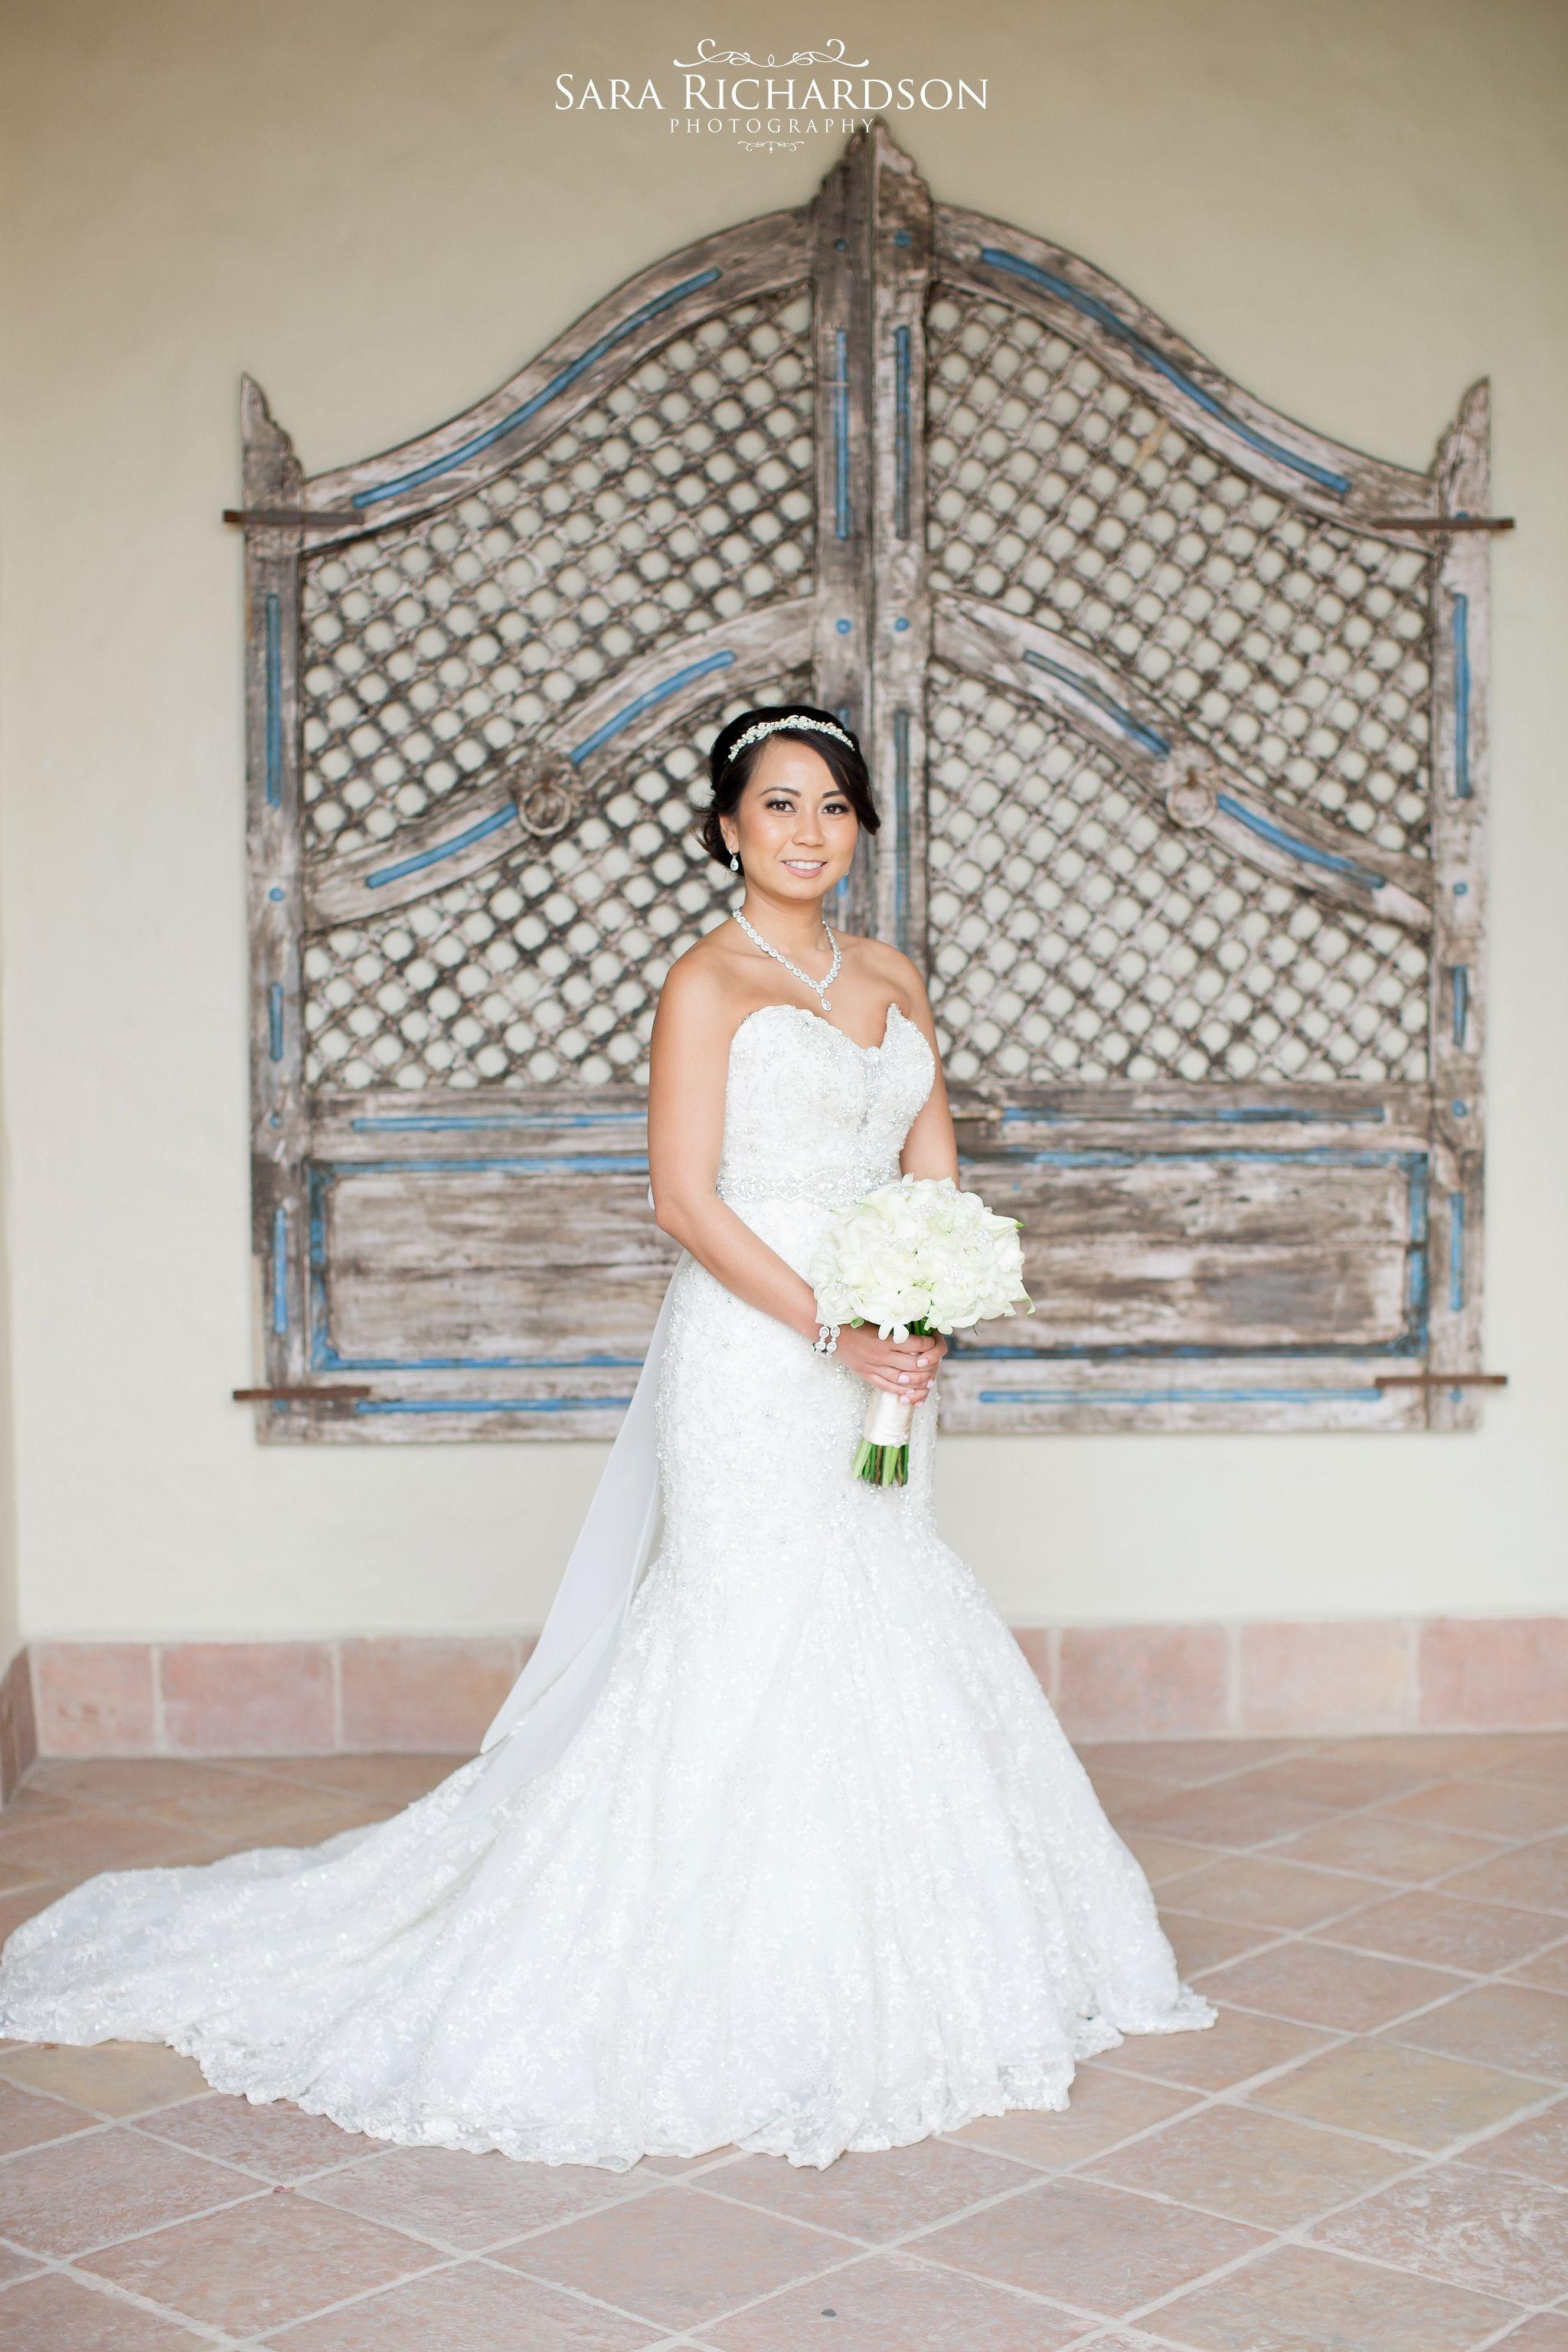 Wedding Venue in Cabo San Lucas Hacienda Cocina & Cantina